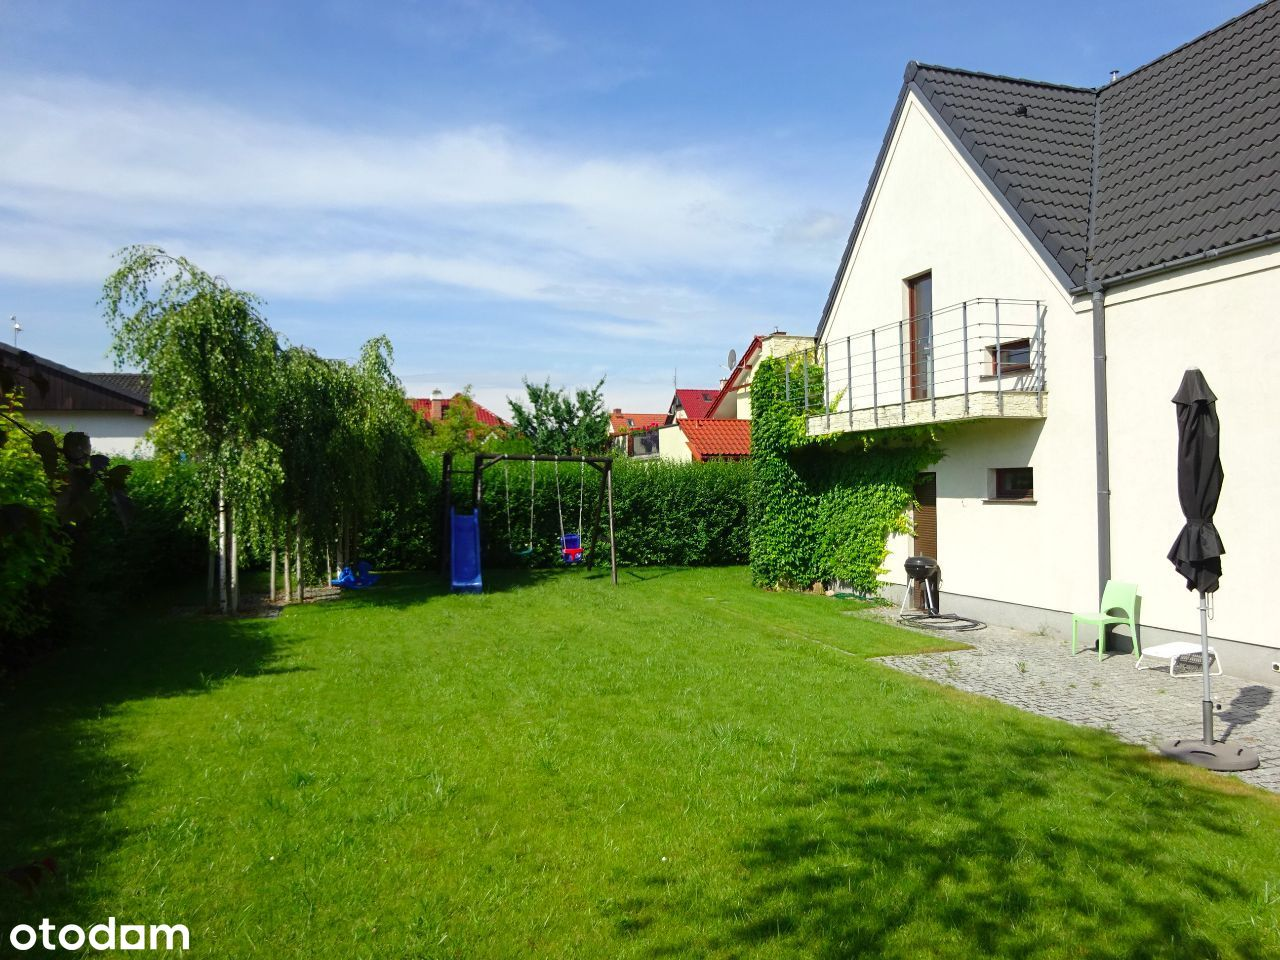 Ciche miejsce,ładny ogród,5pokoi,garaż.